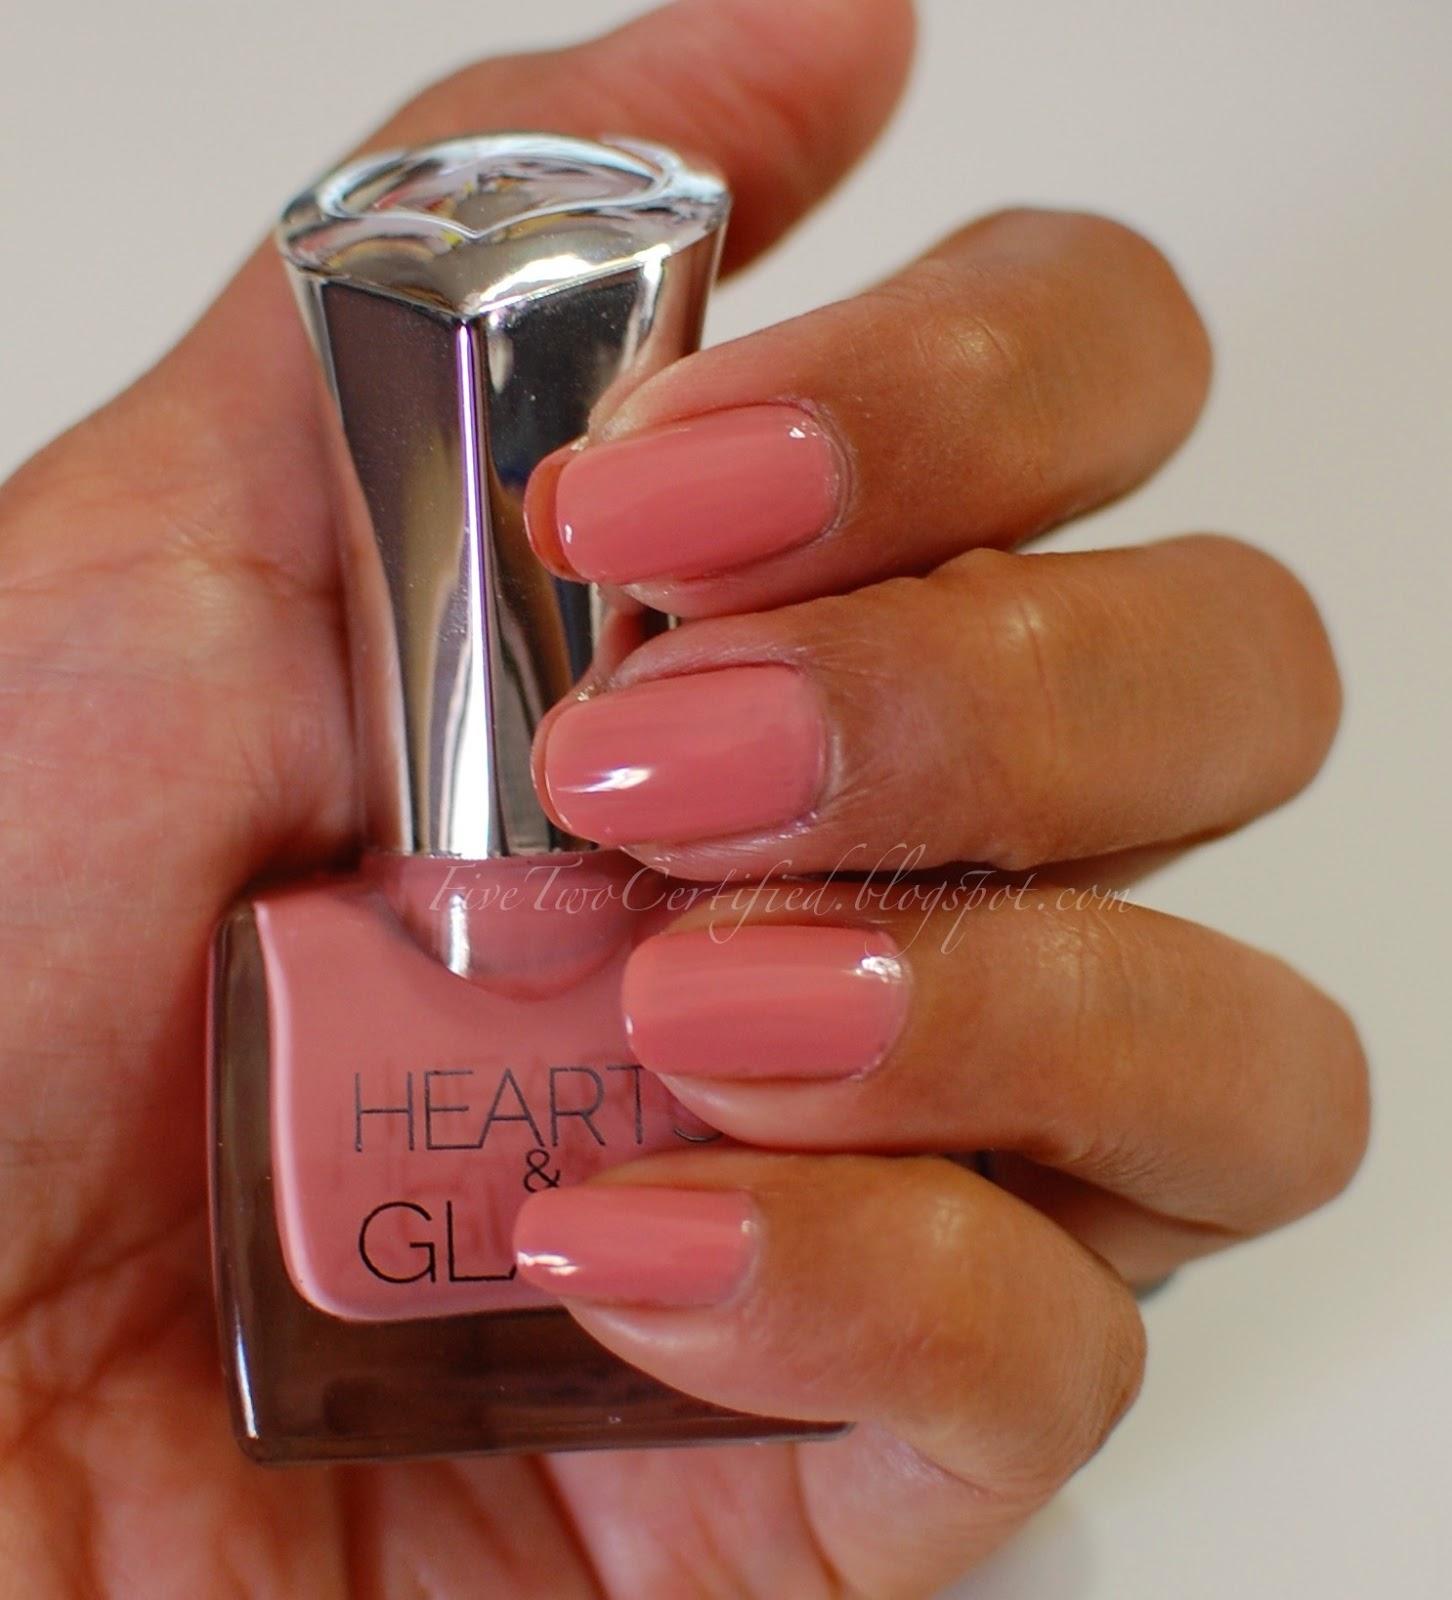 fivetwo beauty: New Fall Nail Polish shades from Hearts & Glass